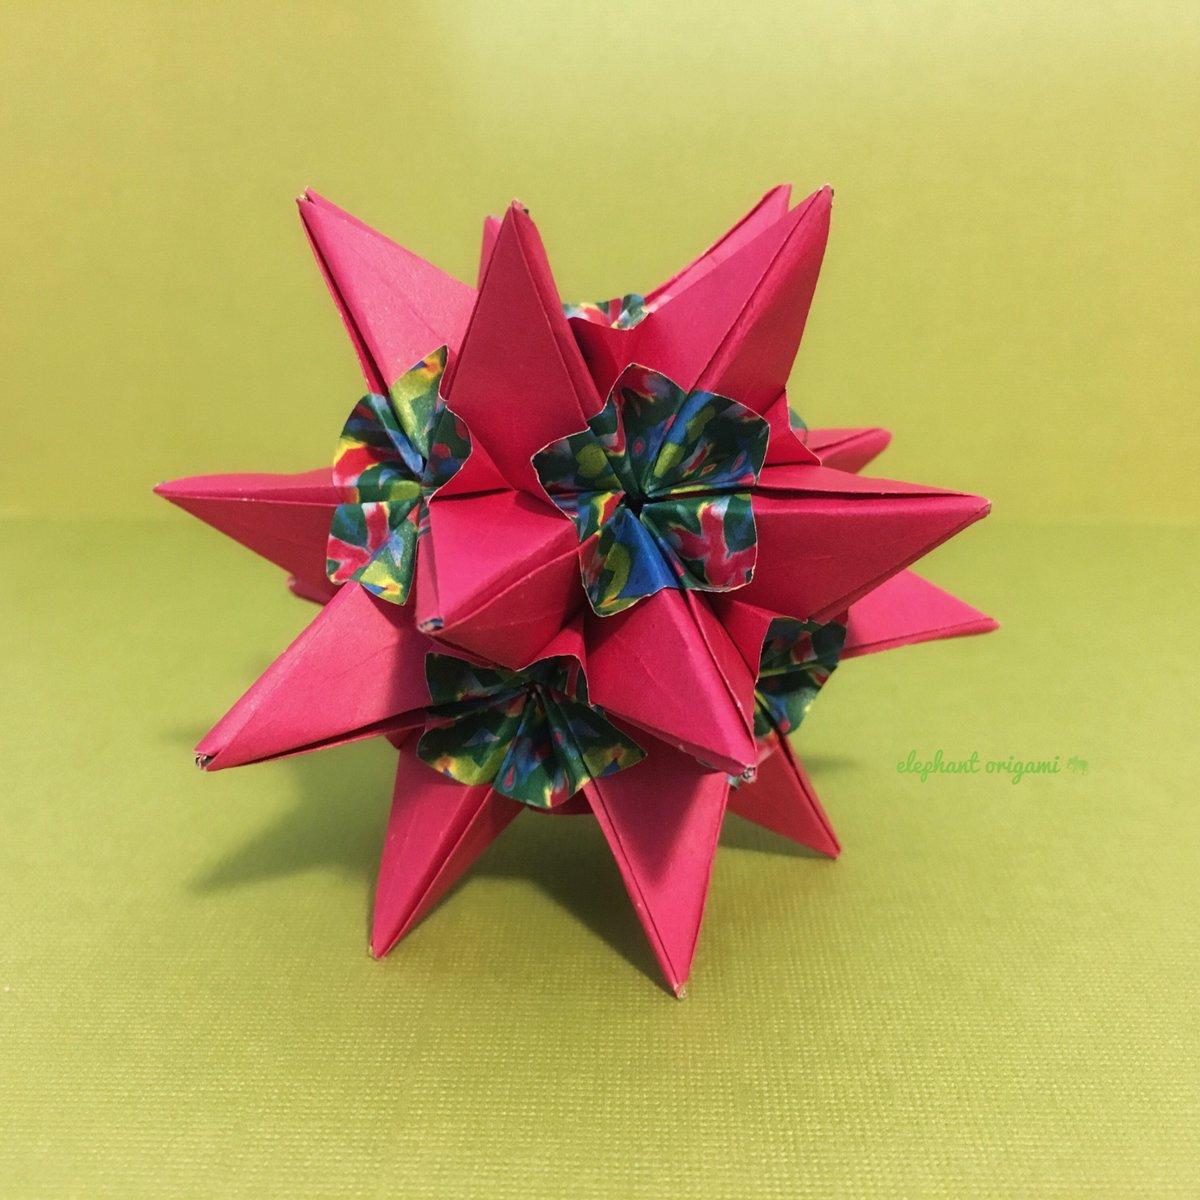 Origami star flower gallery flower decoration ideas elephant origami elephant0rigami twitter a constellation of flower stars flower star and flower star variation designed mightylinksfo Images